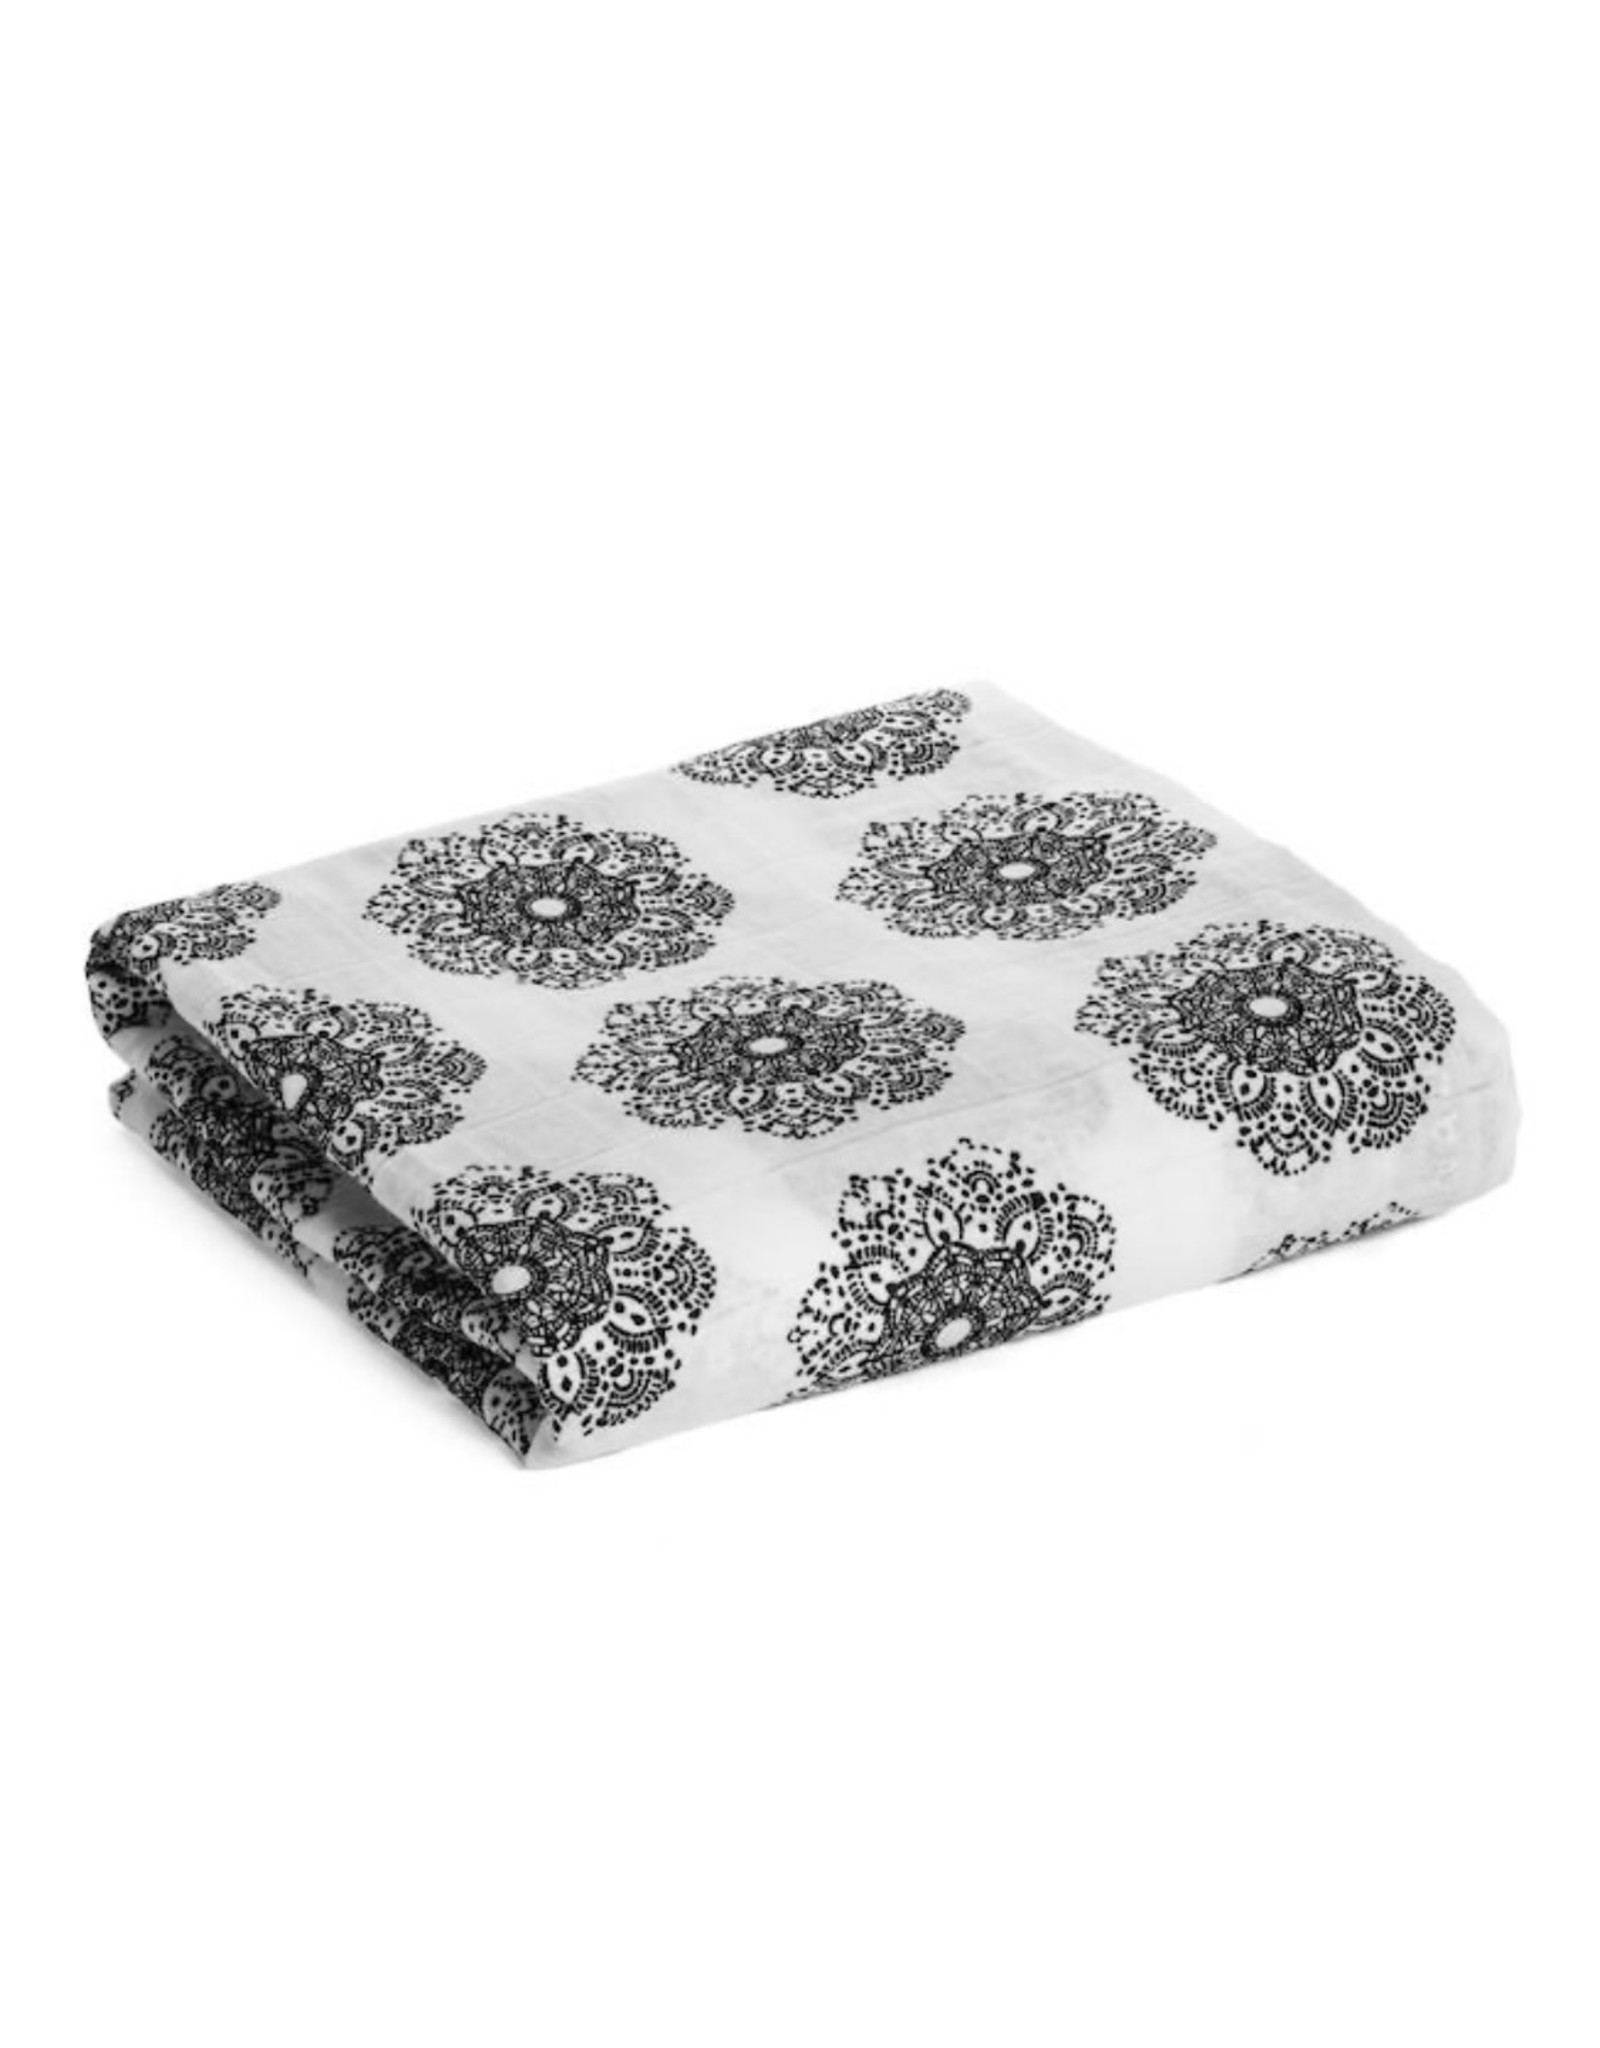 Modern Burlap Modern Burlap- Doily Lace Swaddle